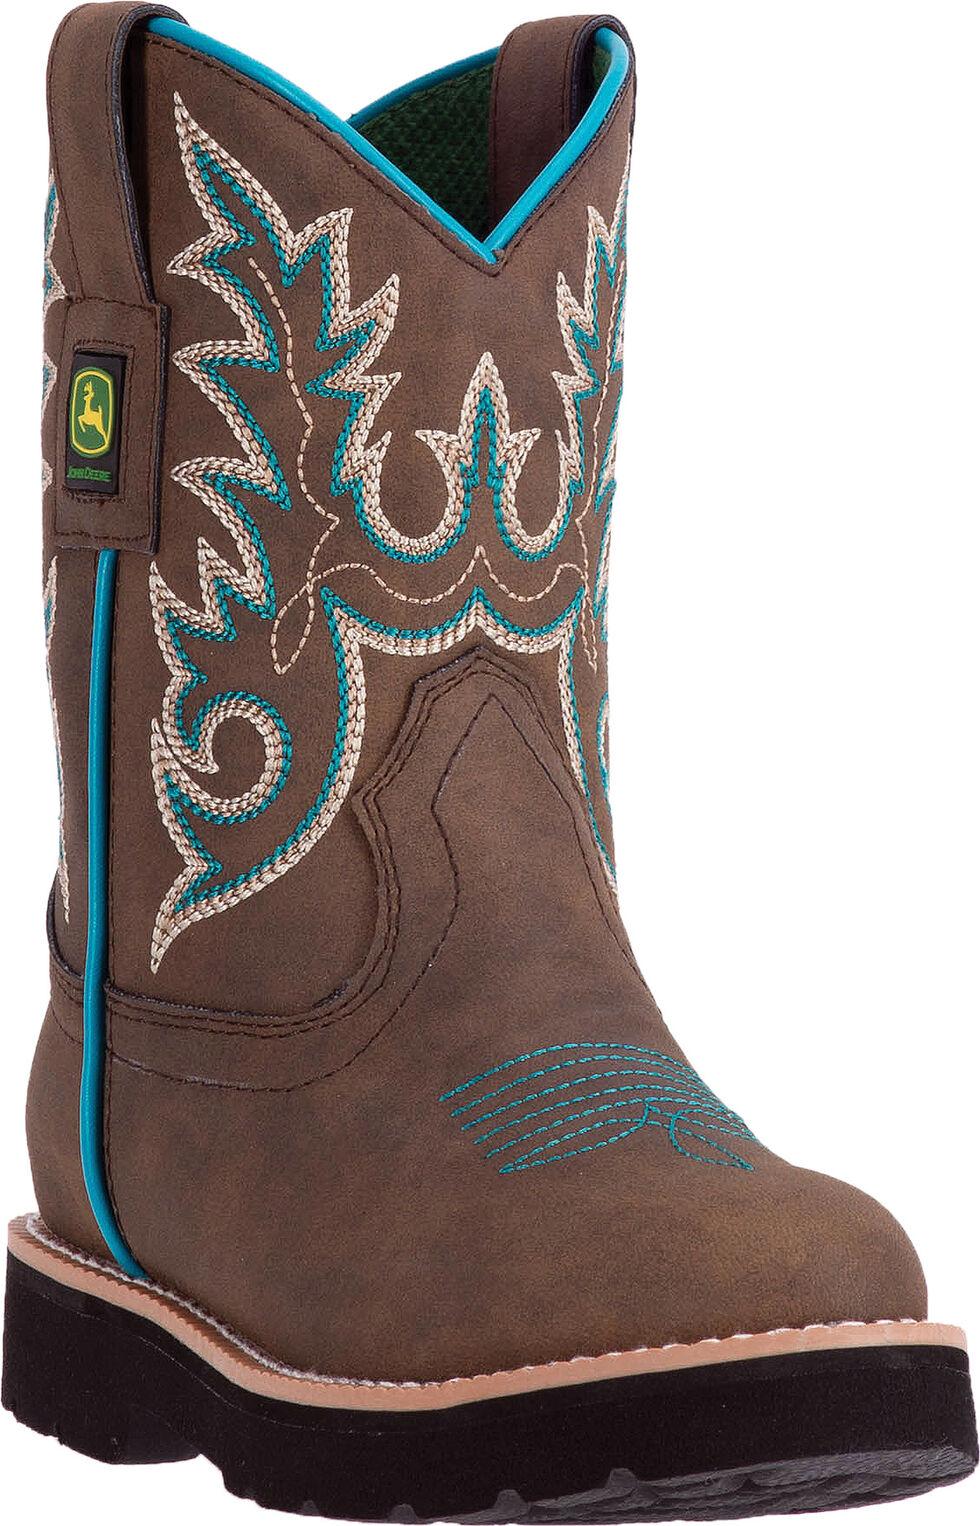 John Deere Kid's Tan Turquoise Cowboy Boots - Round Toe, Tan, hi-res